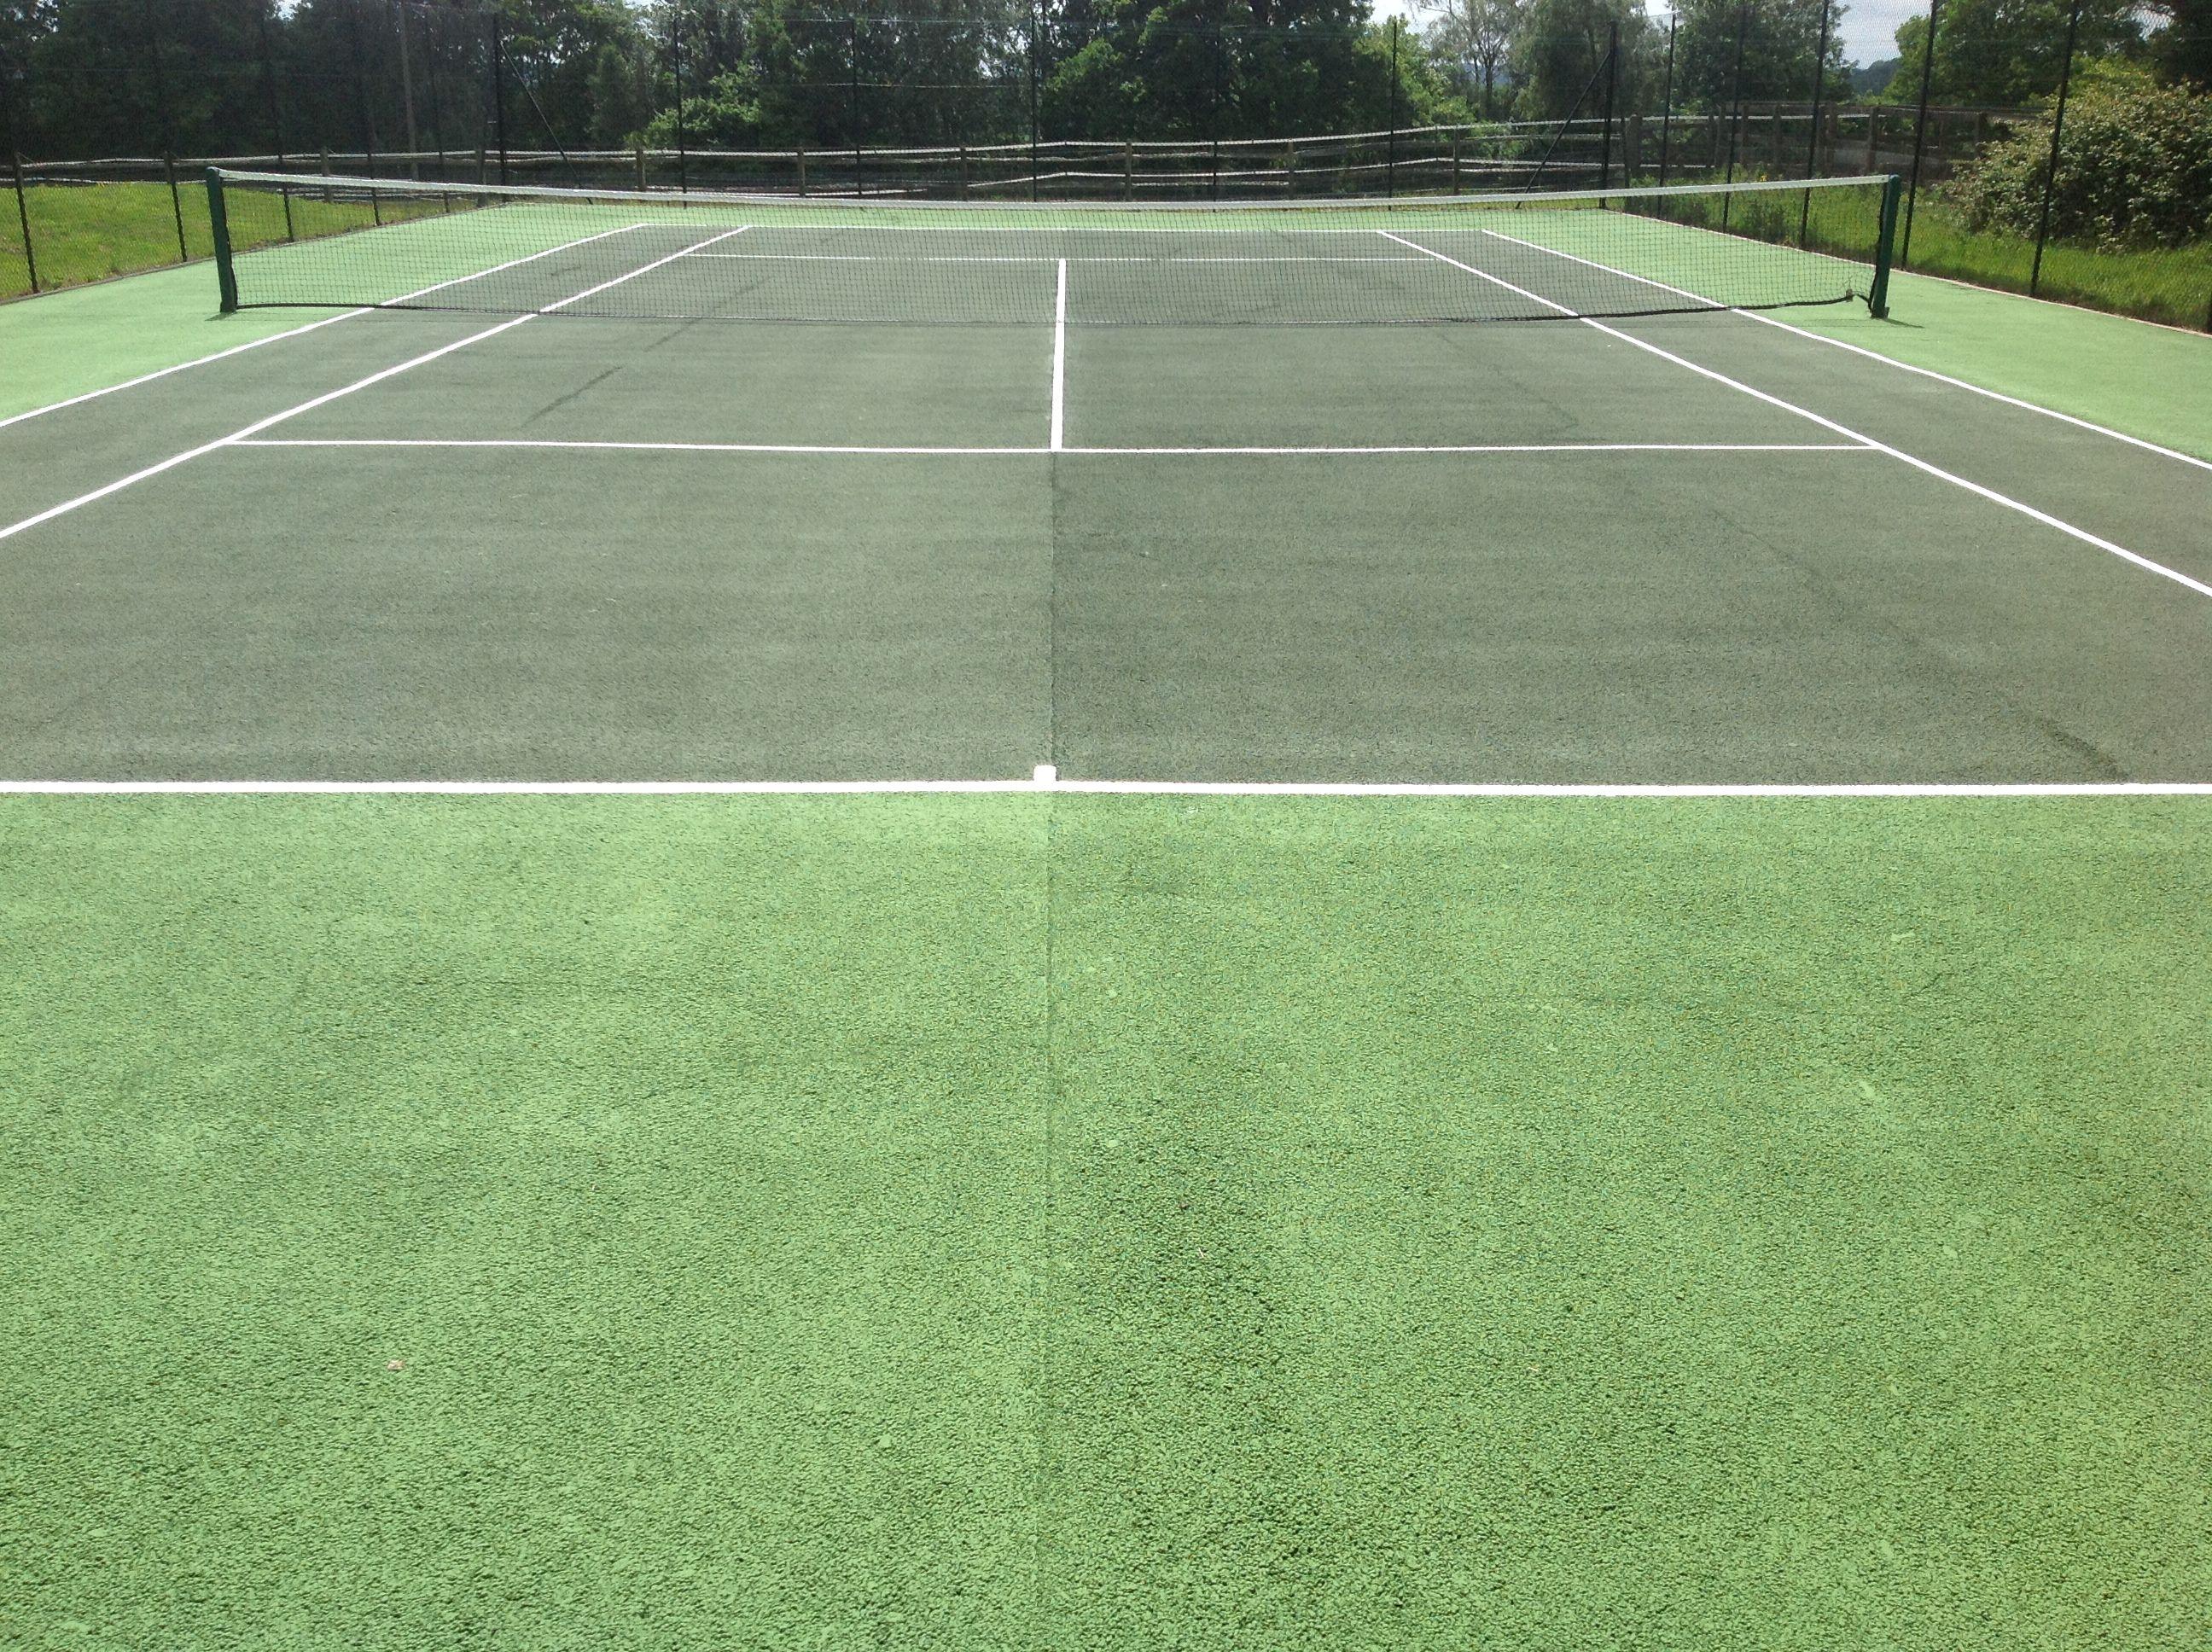 Tennis Court Repair Specialists In Staffordshire 3 Tennis Court